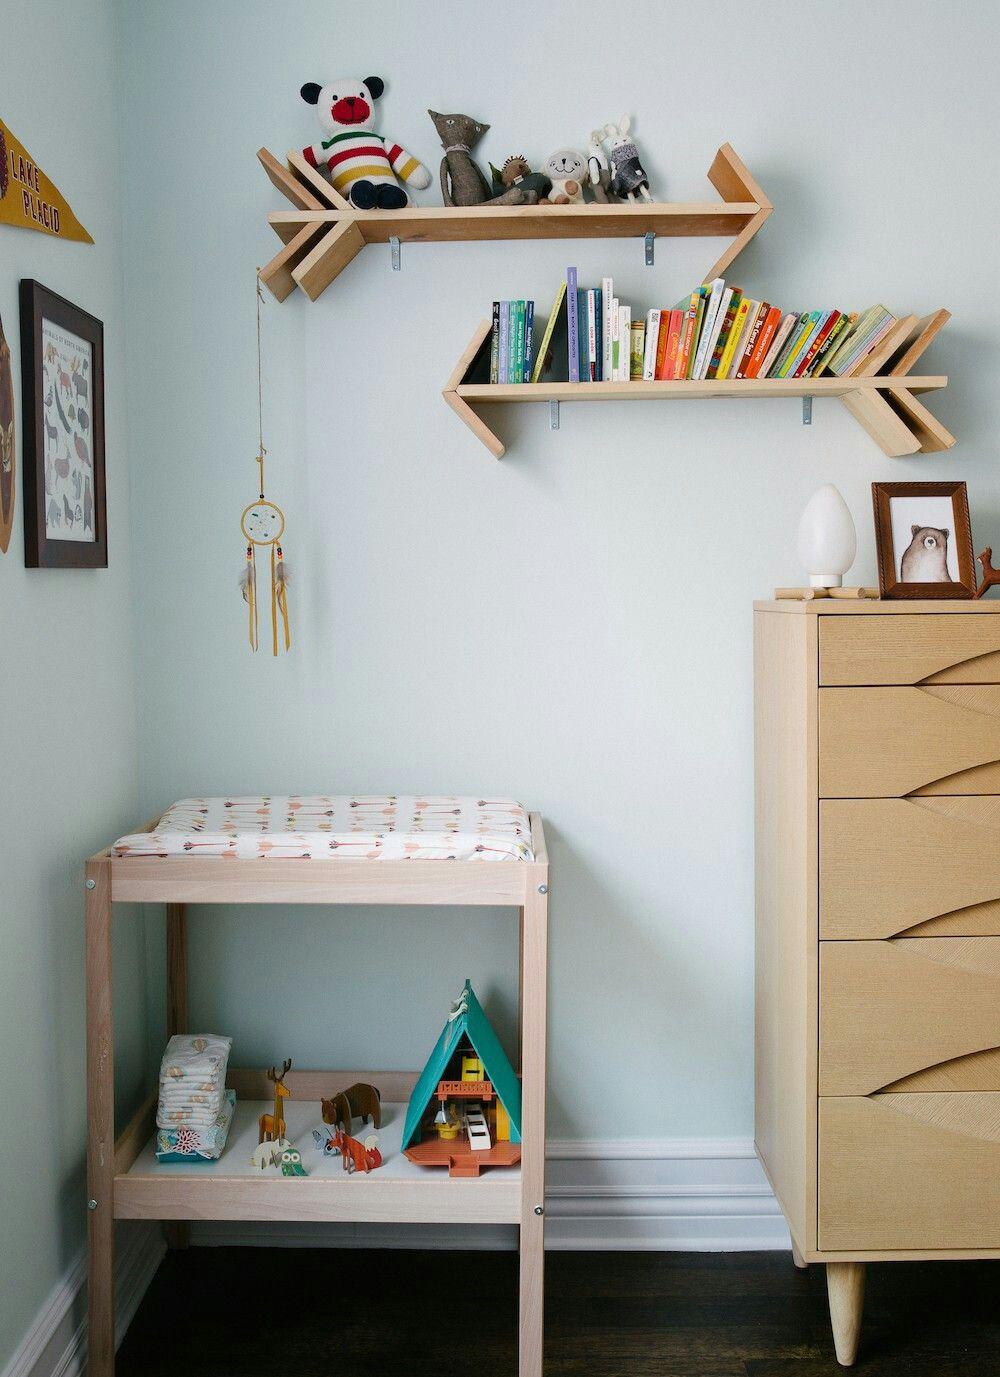 Arrow shelves baby room shelves kids wall shelves